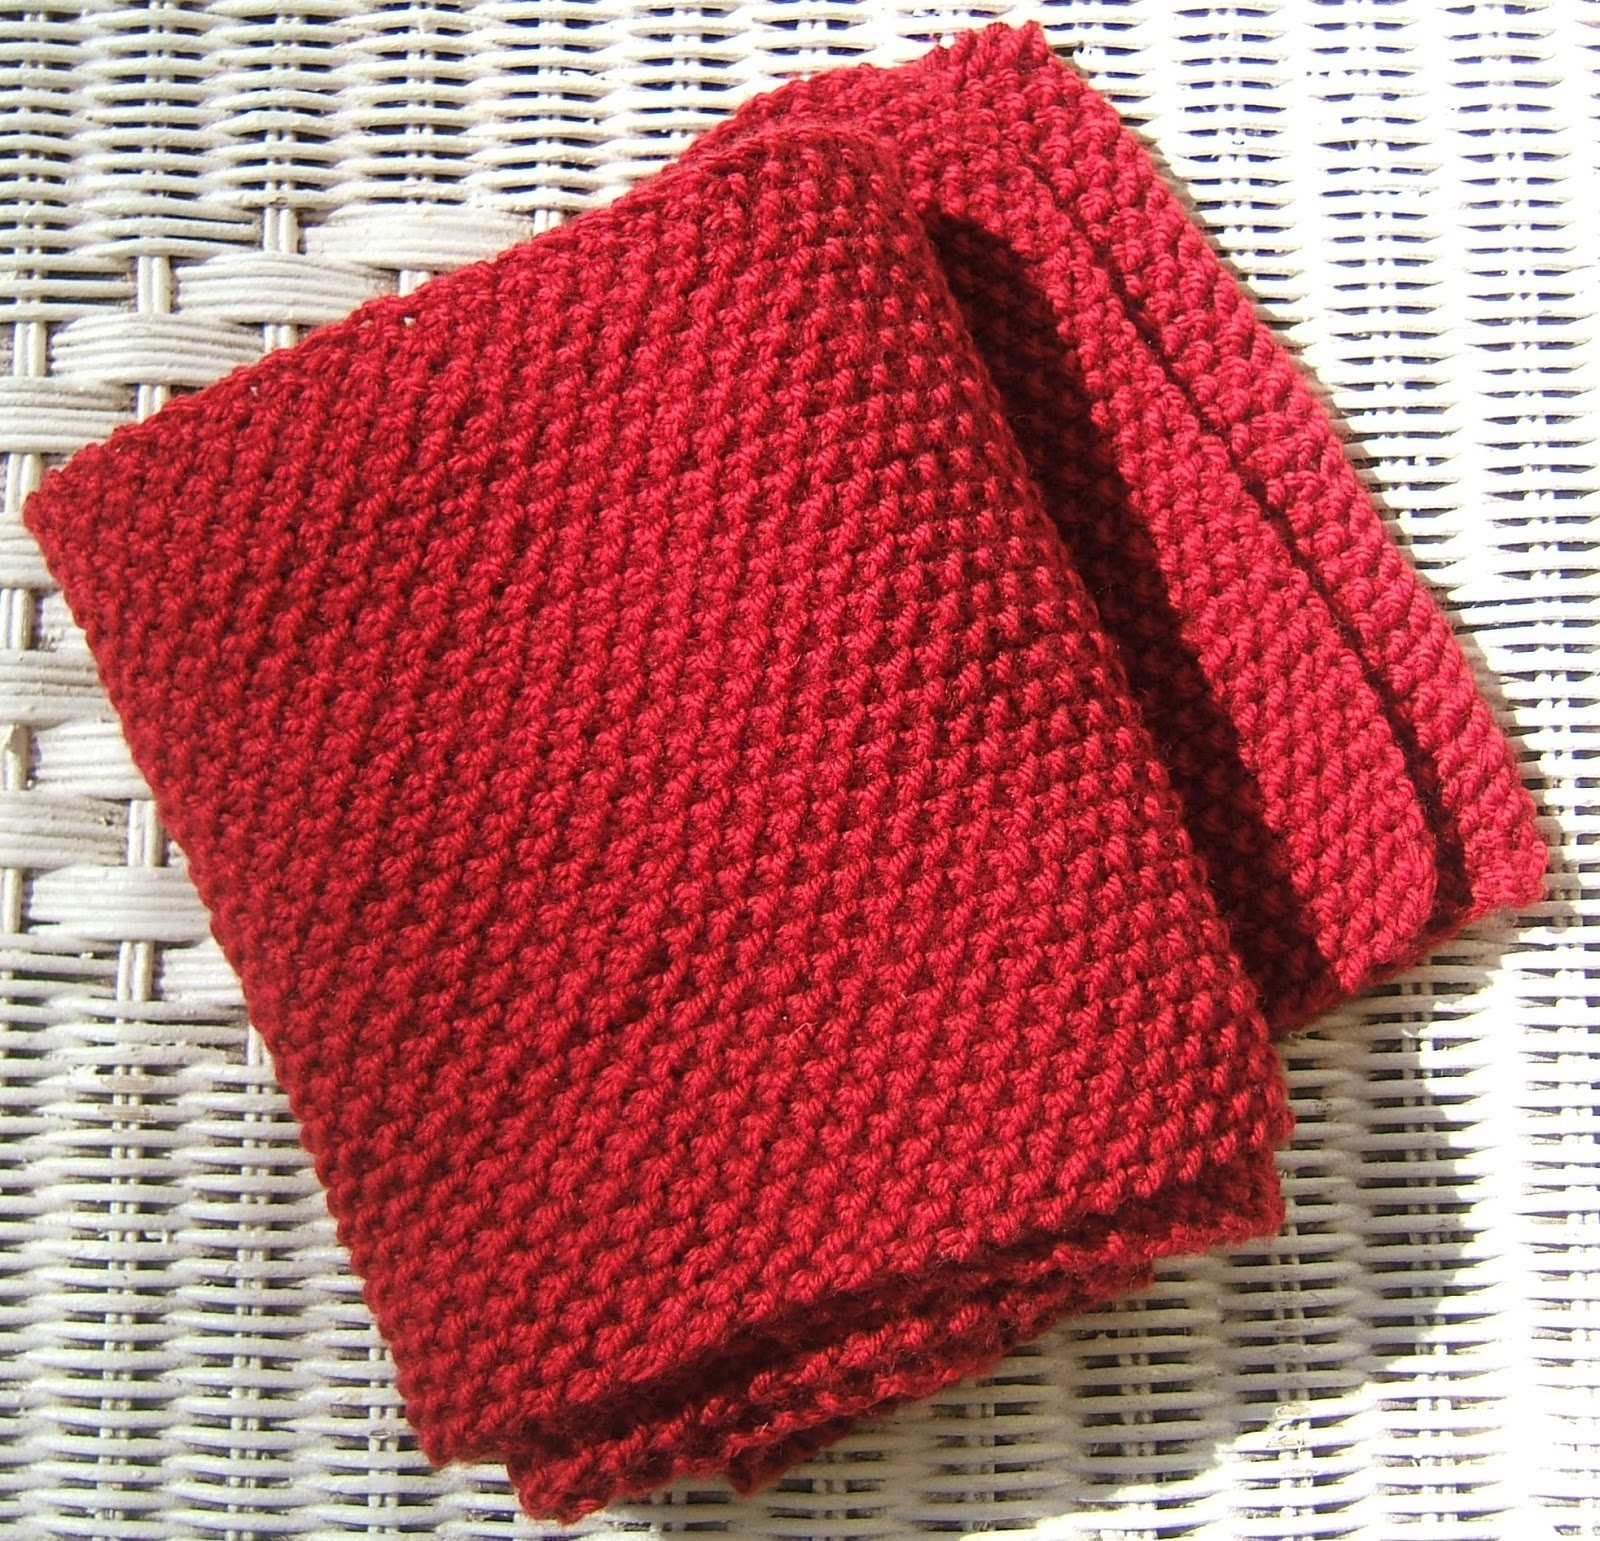 Moss Stitch Scarf Knitting Pattern Aussie Knitting Threads Moss Stitch Scarf Beginners